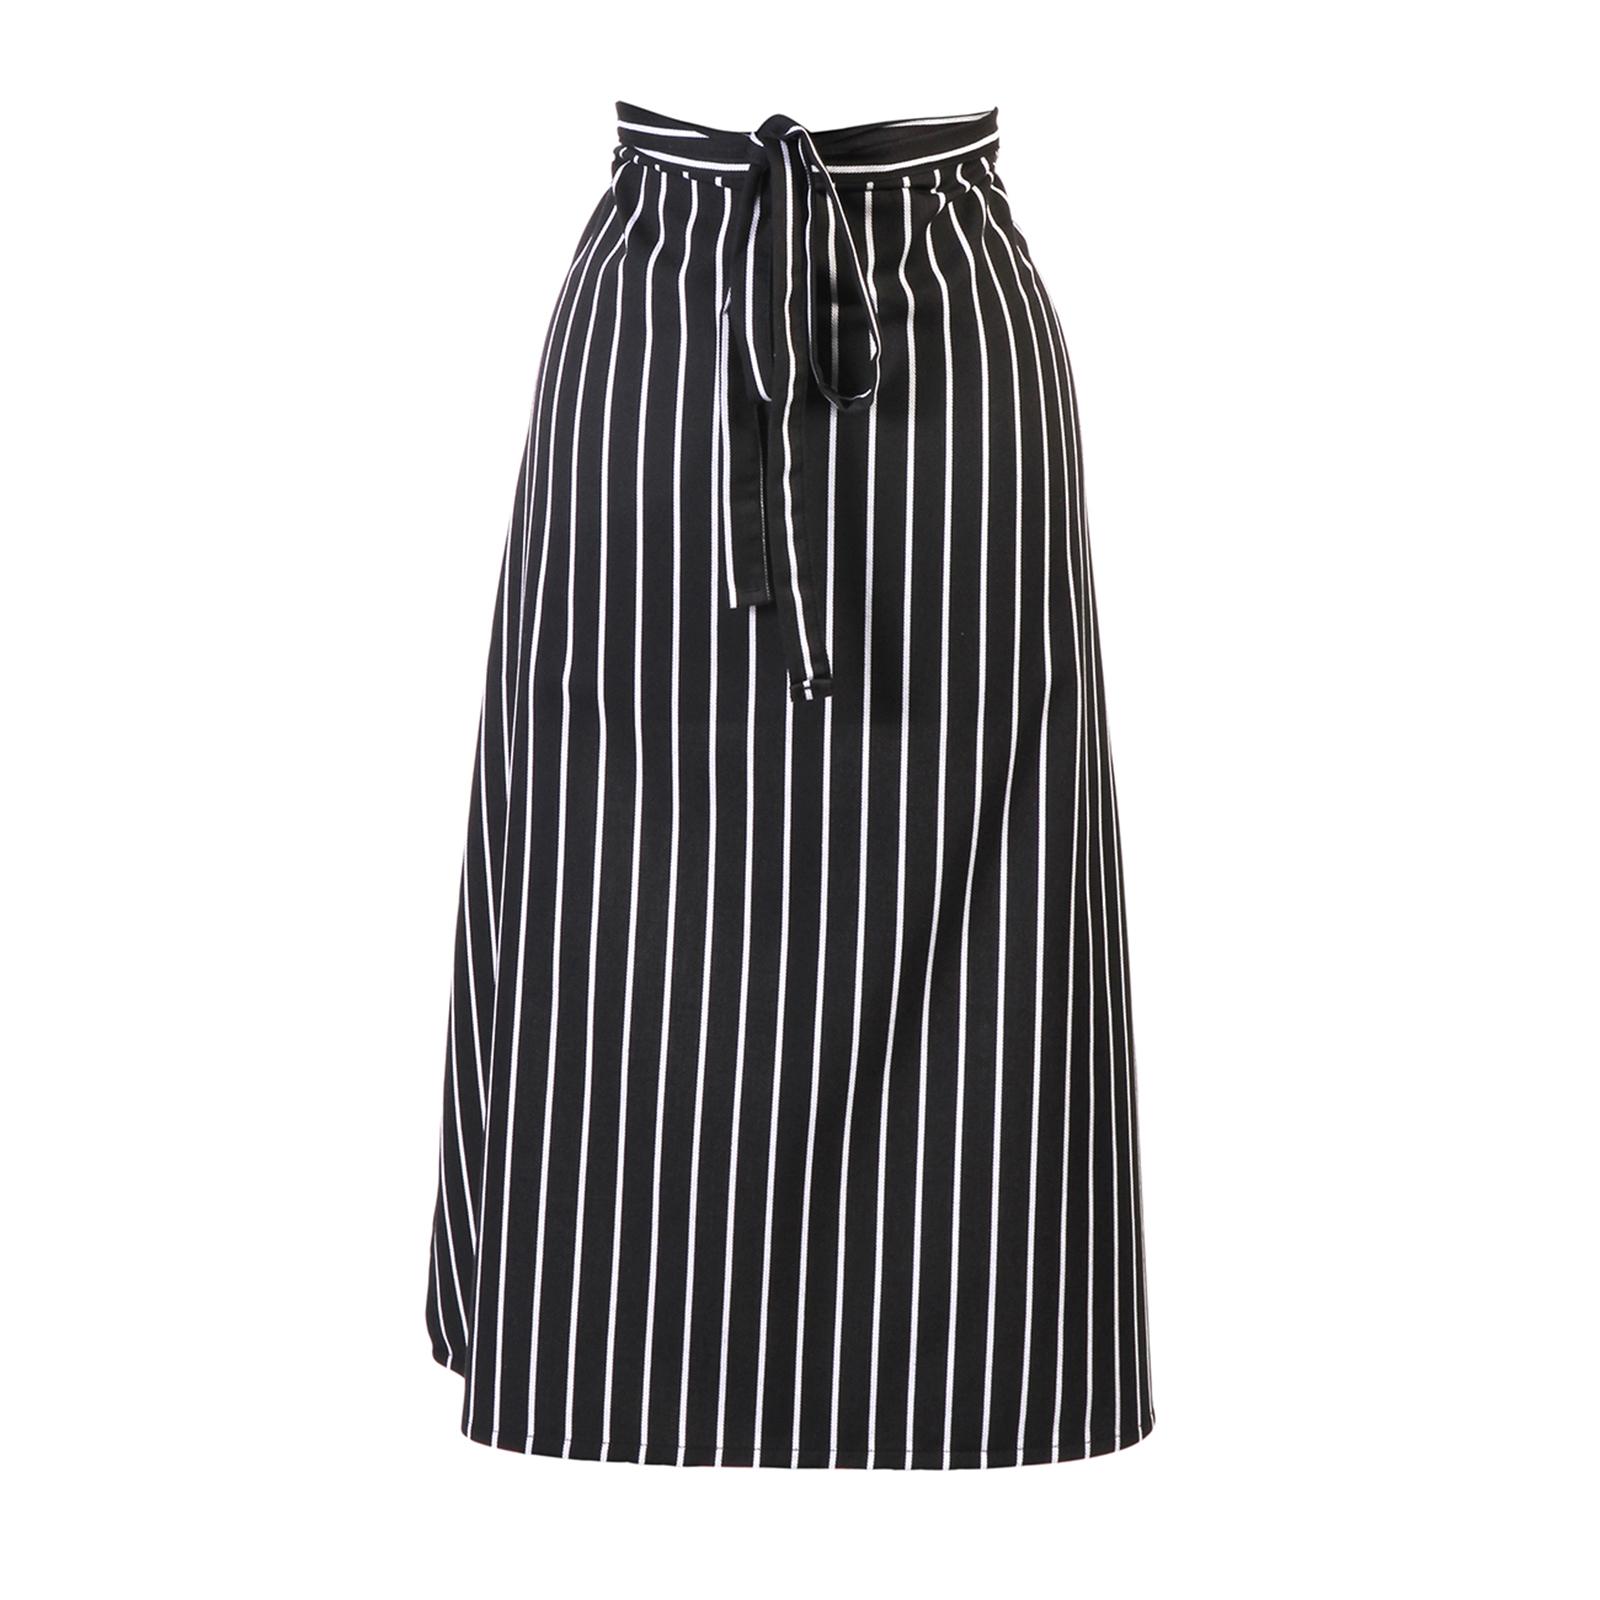 Mercer Culinary M61130BCS waist apron